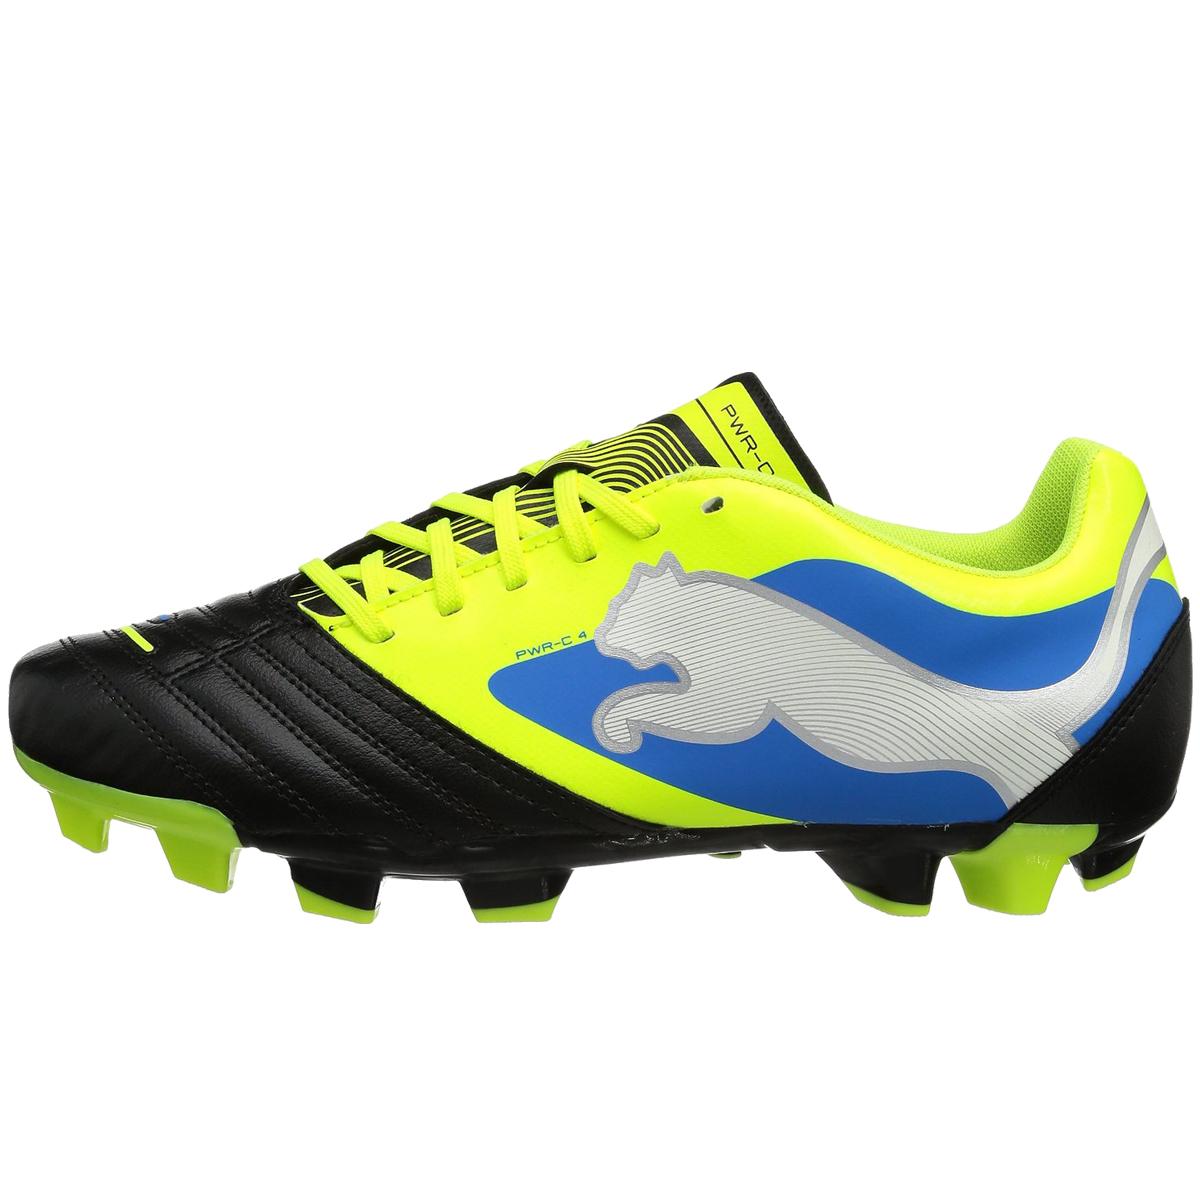 Mens Puma Powercat 4 Fg Firm Ground Black Football Boots